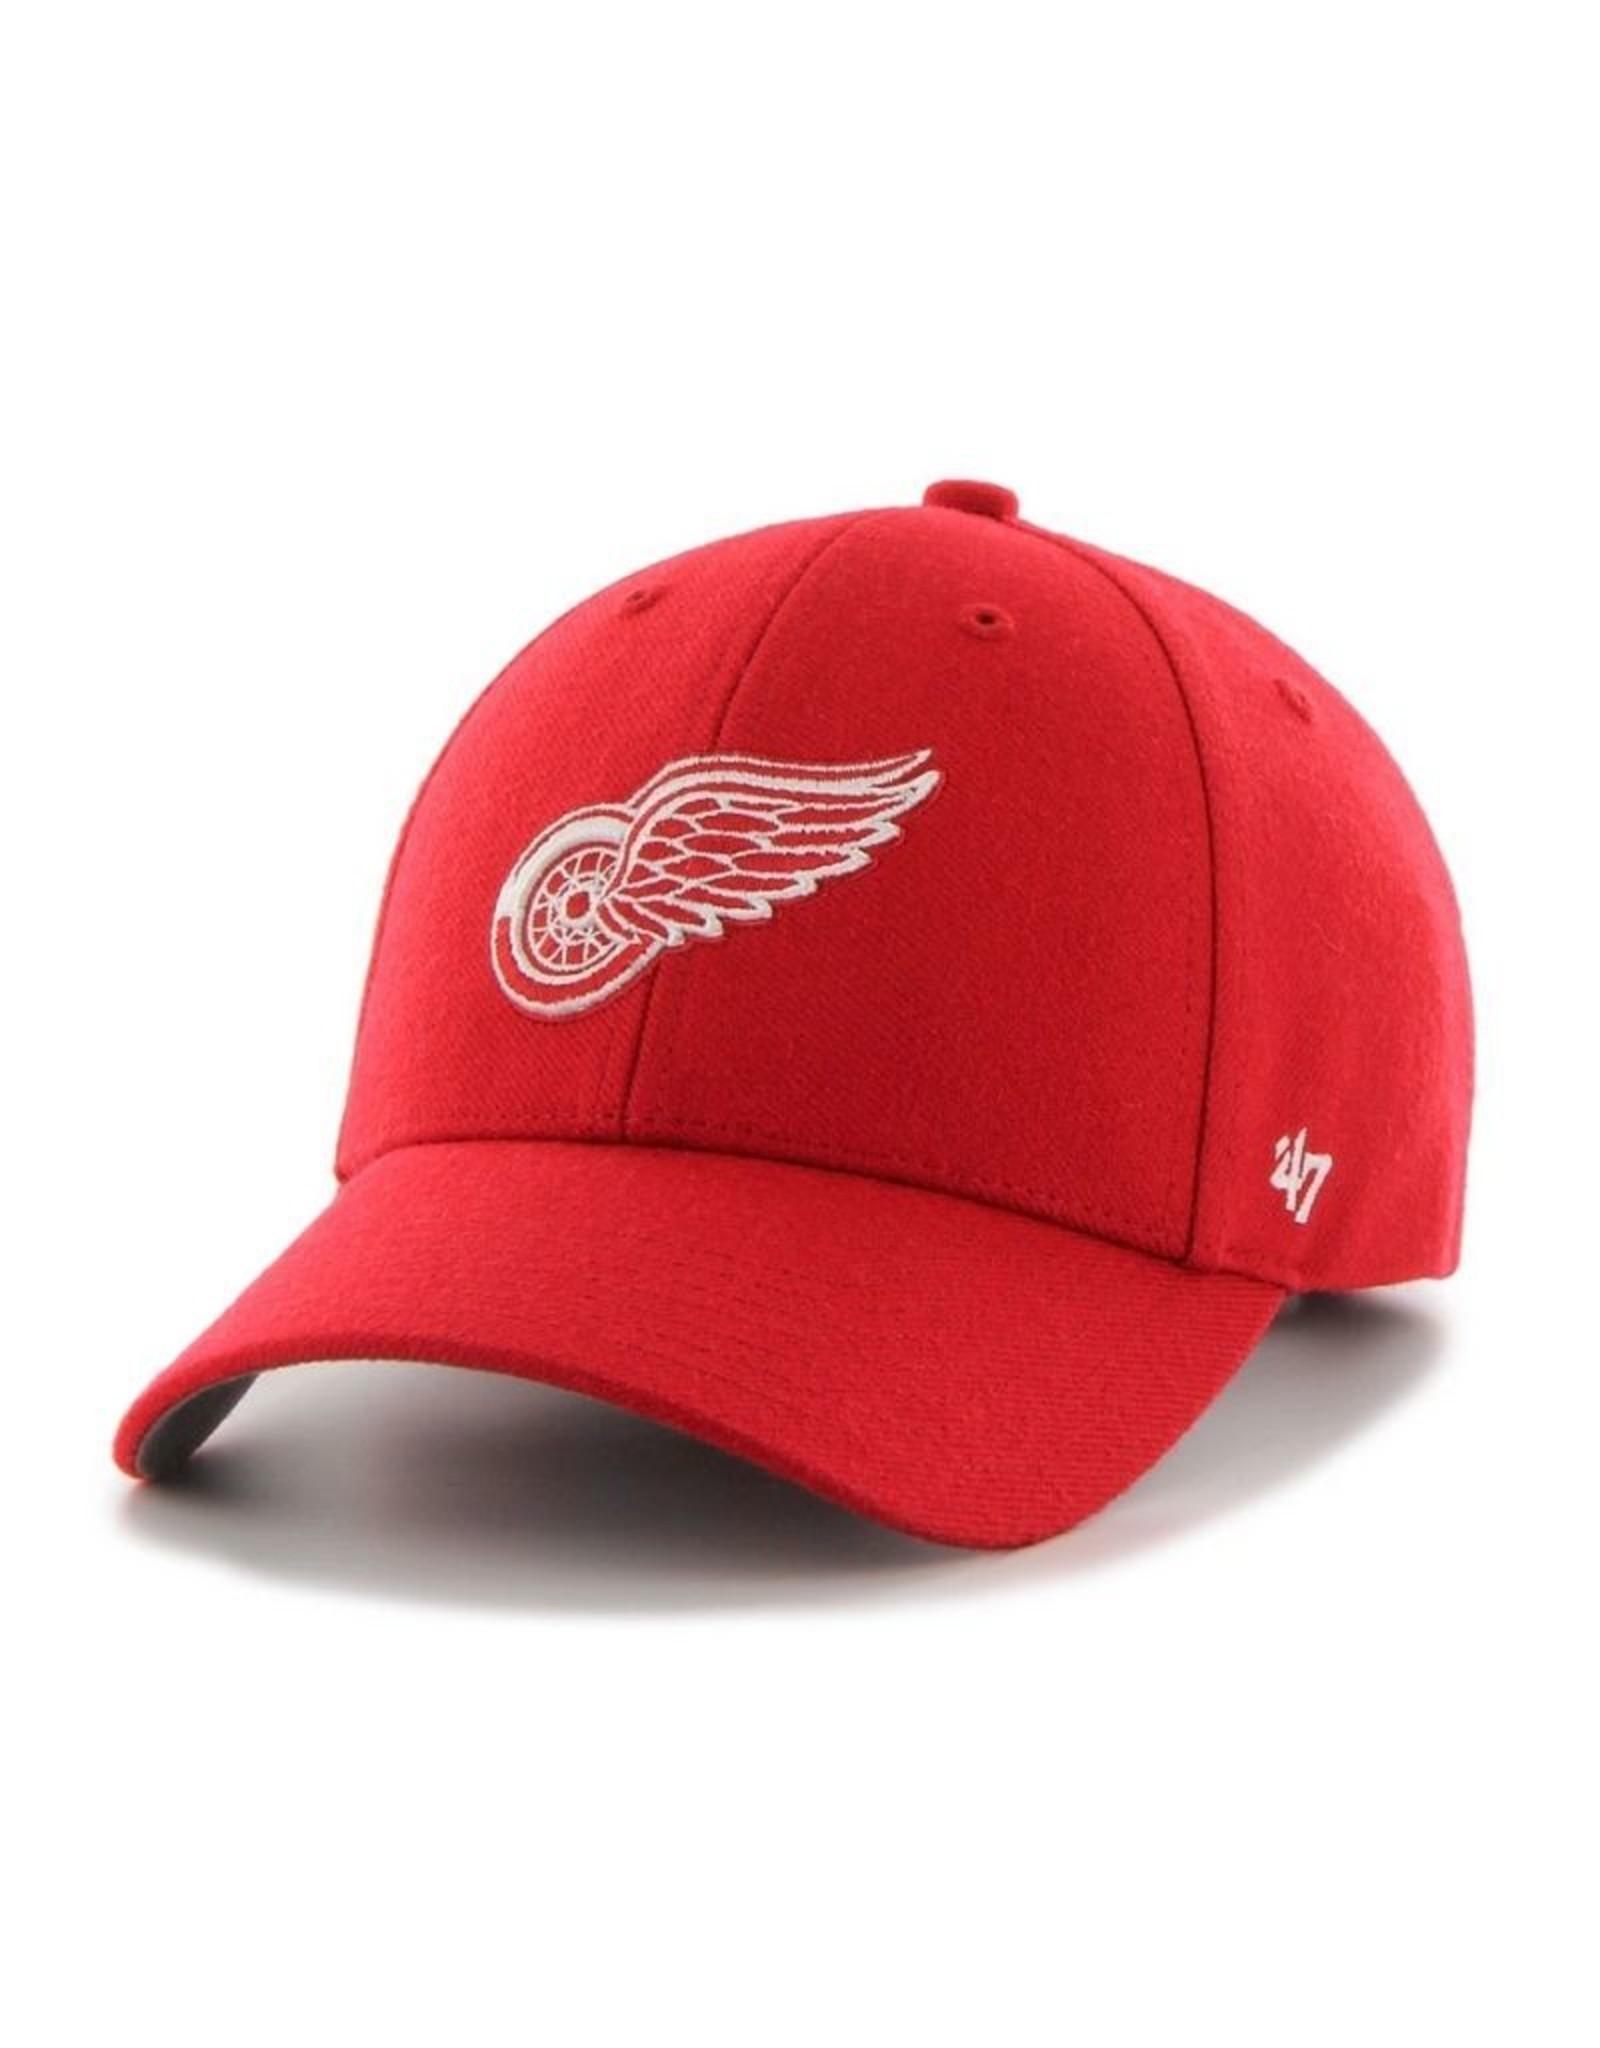 '47 MVP Men's Hat Primary Logo Detroit Red Wings Red Adjustable